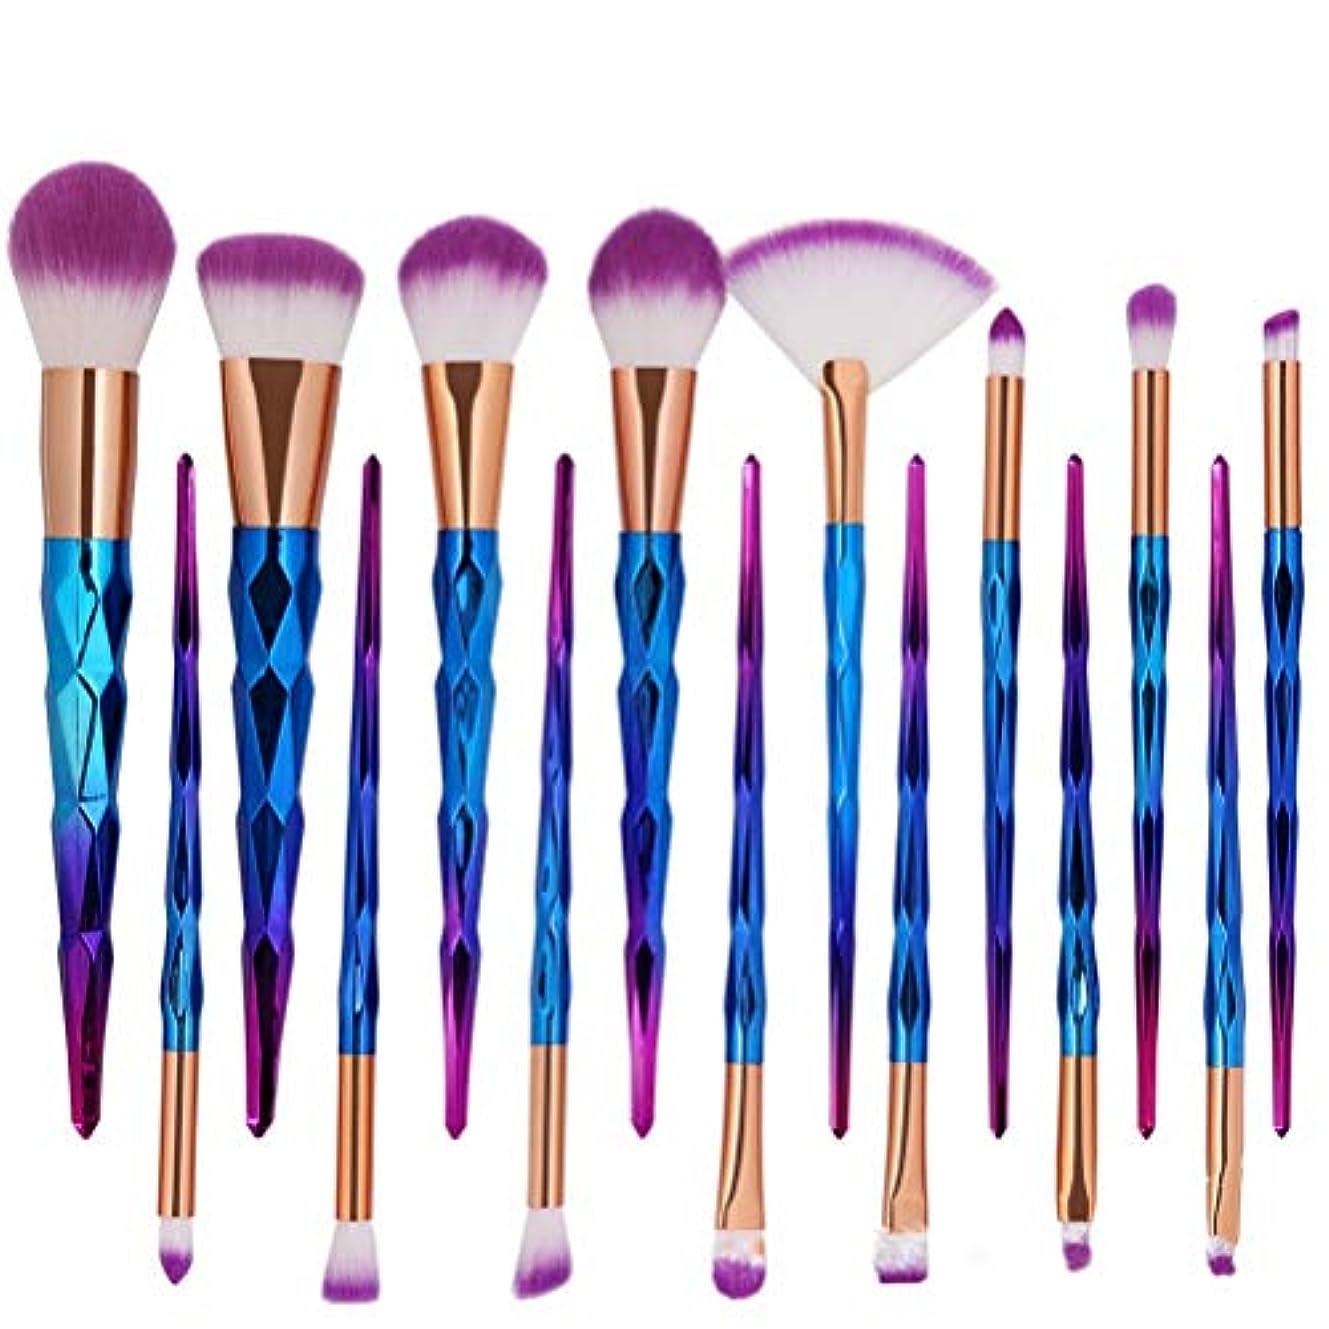 LSHJP 化粧ブラシ 15個 不規則な 個性的 柔らか 安心 便利 ファッション 自然 ビューティー 高品質 高品質 (Color : Purple, Size : ワンサイズ)